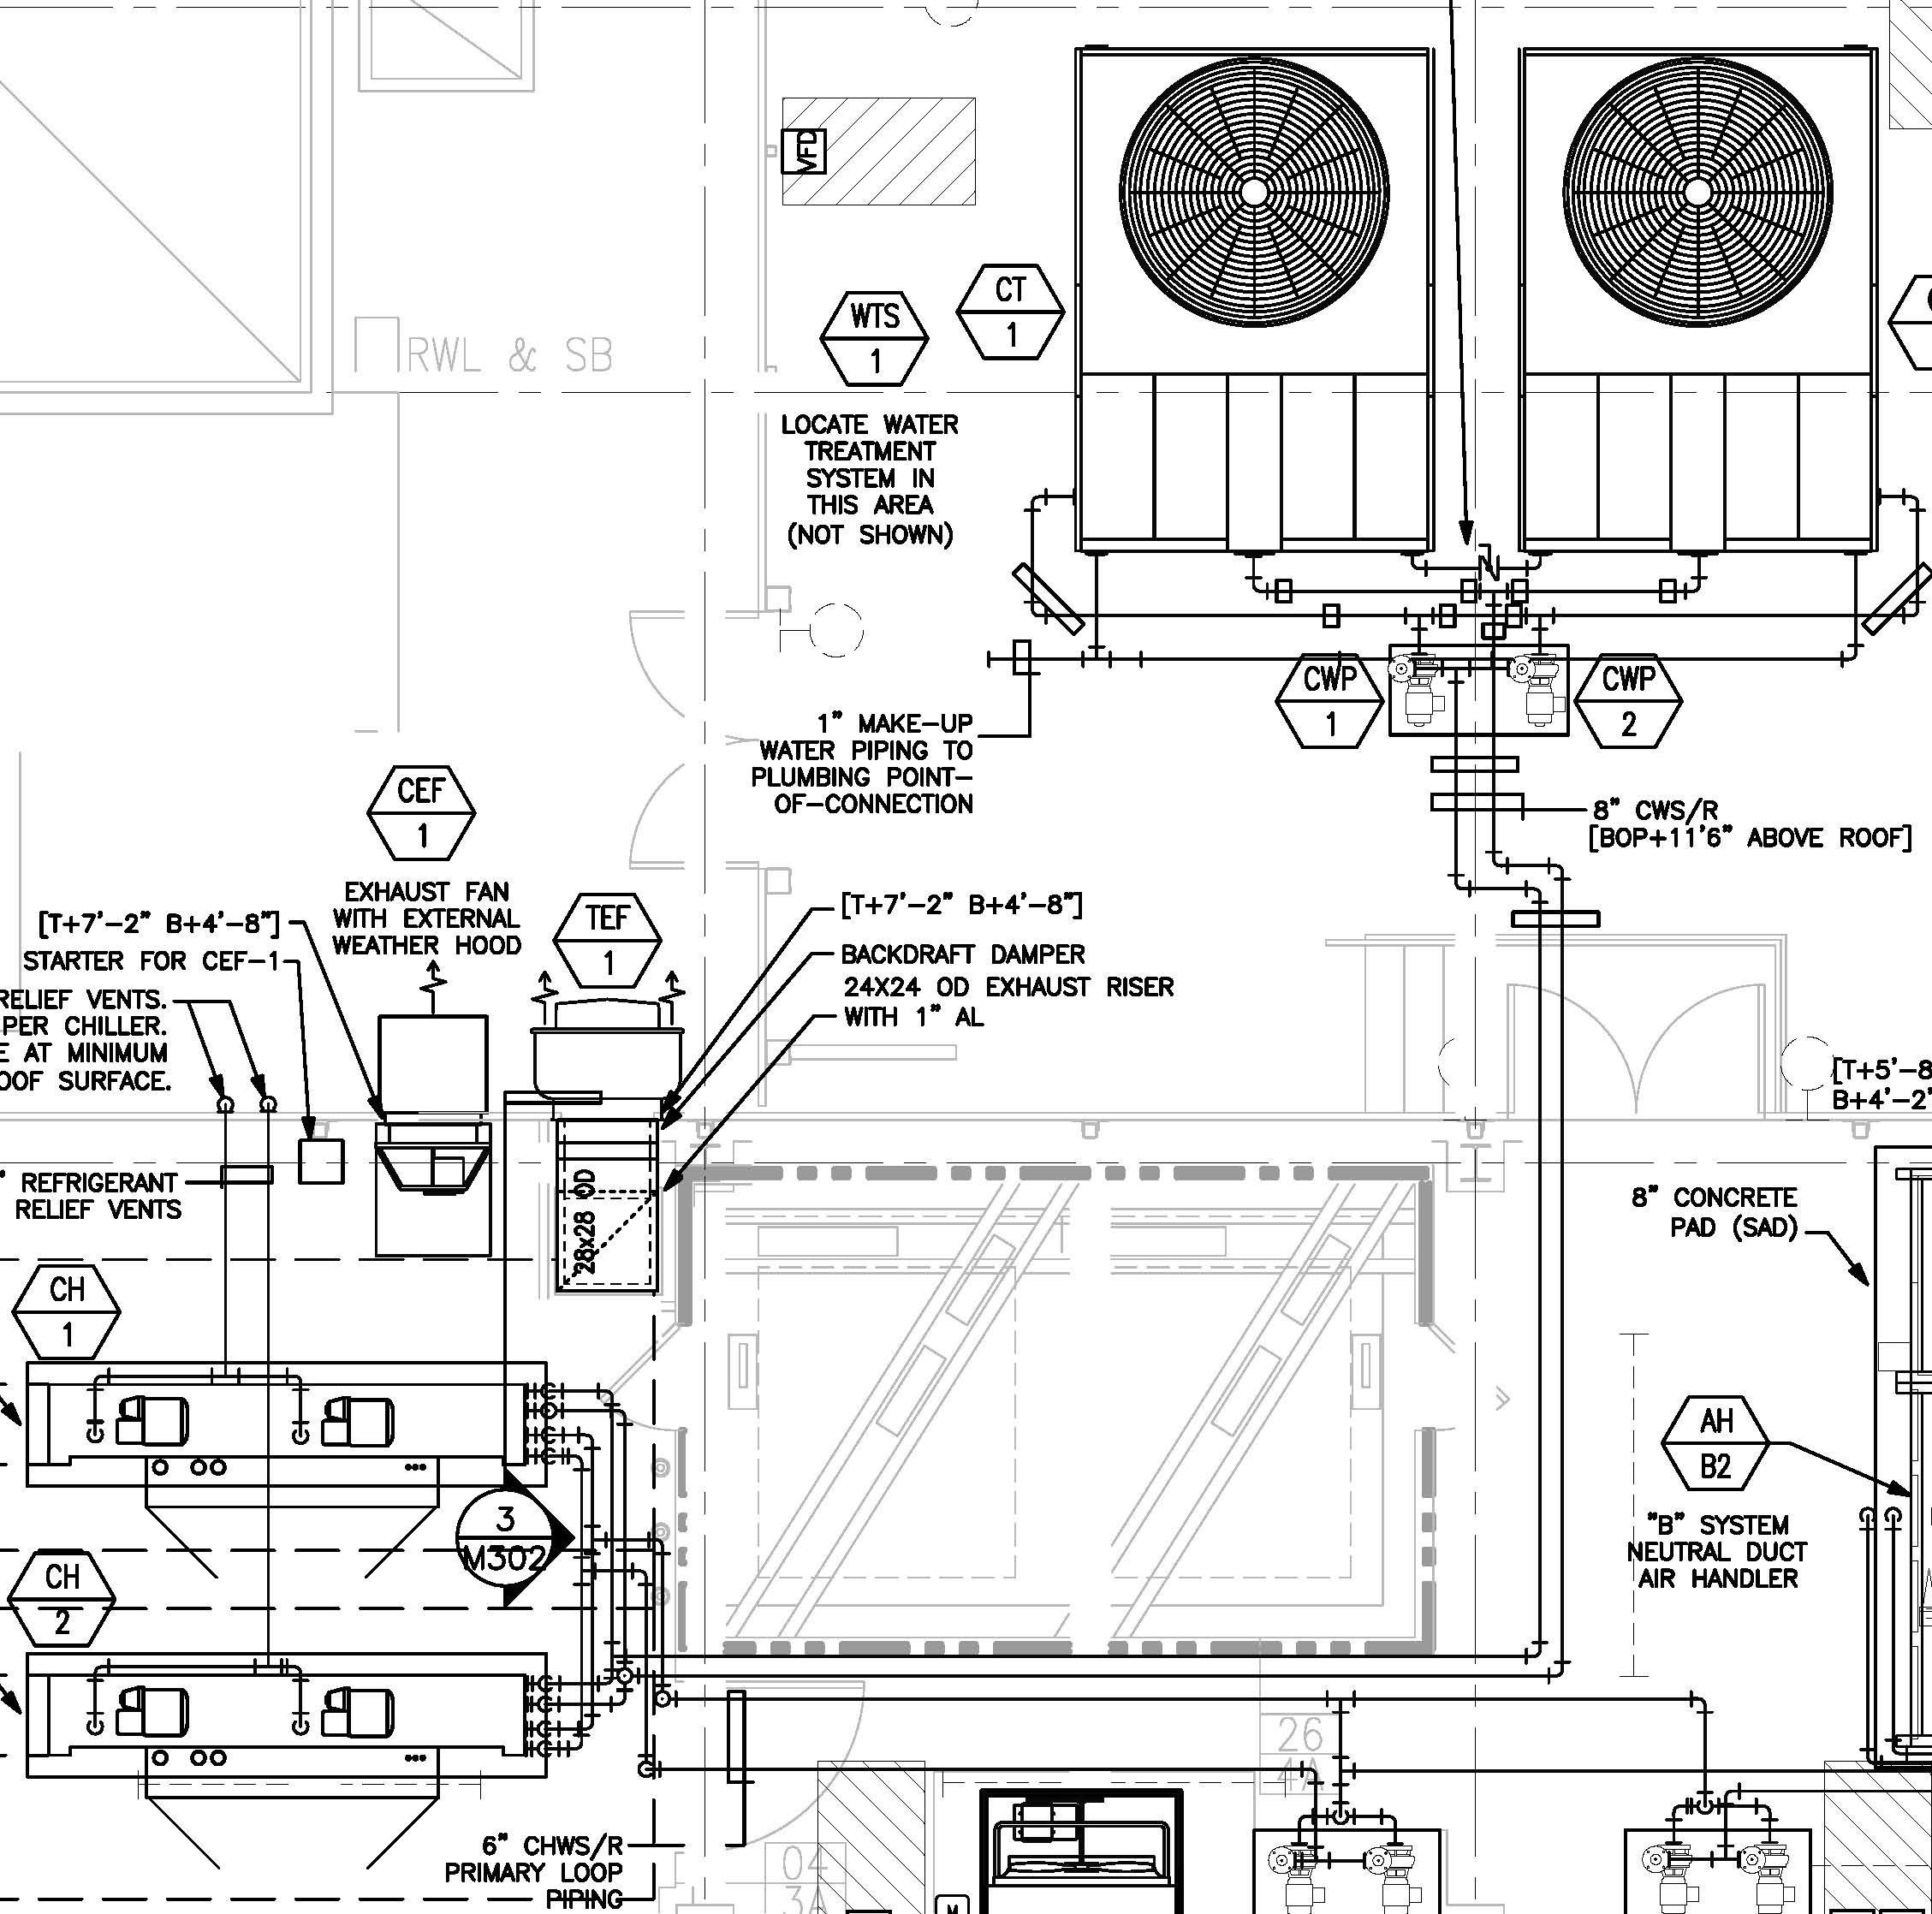 Car Air Conditioner Diagram Wiring Diagram Car Ac Valid Car Lighting System Wiring Diagram Of Car Air Conditioner Diagram